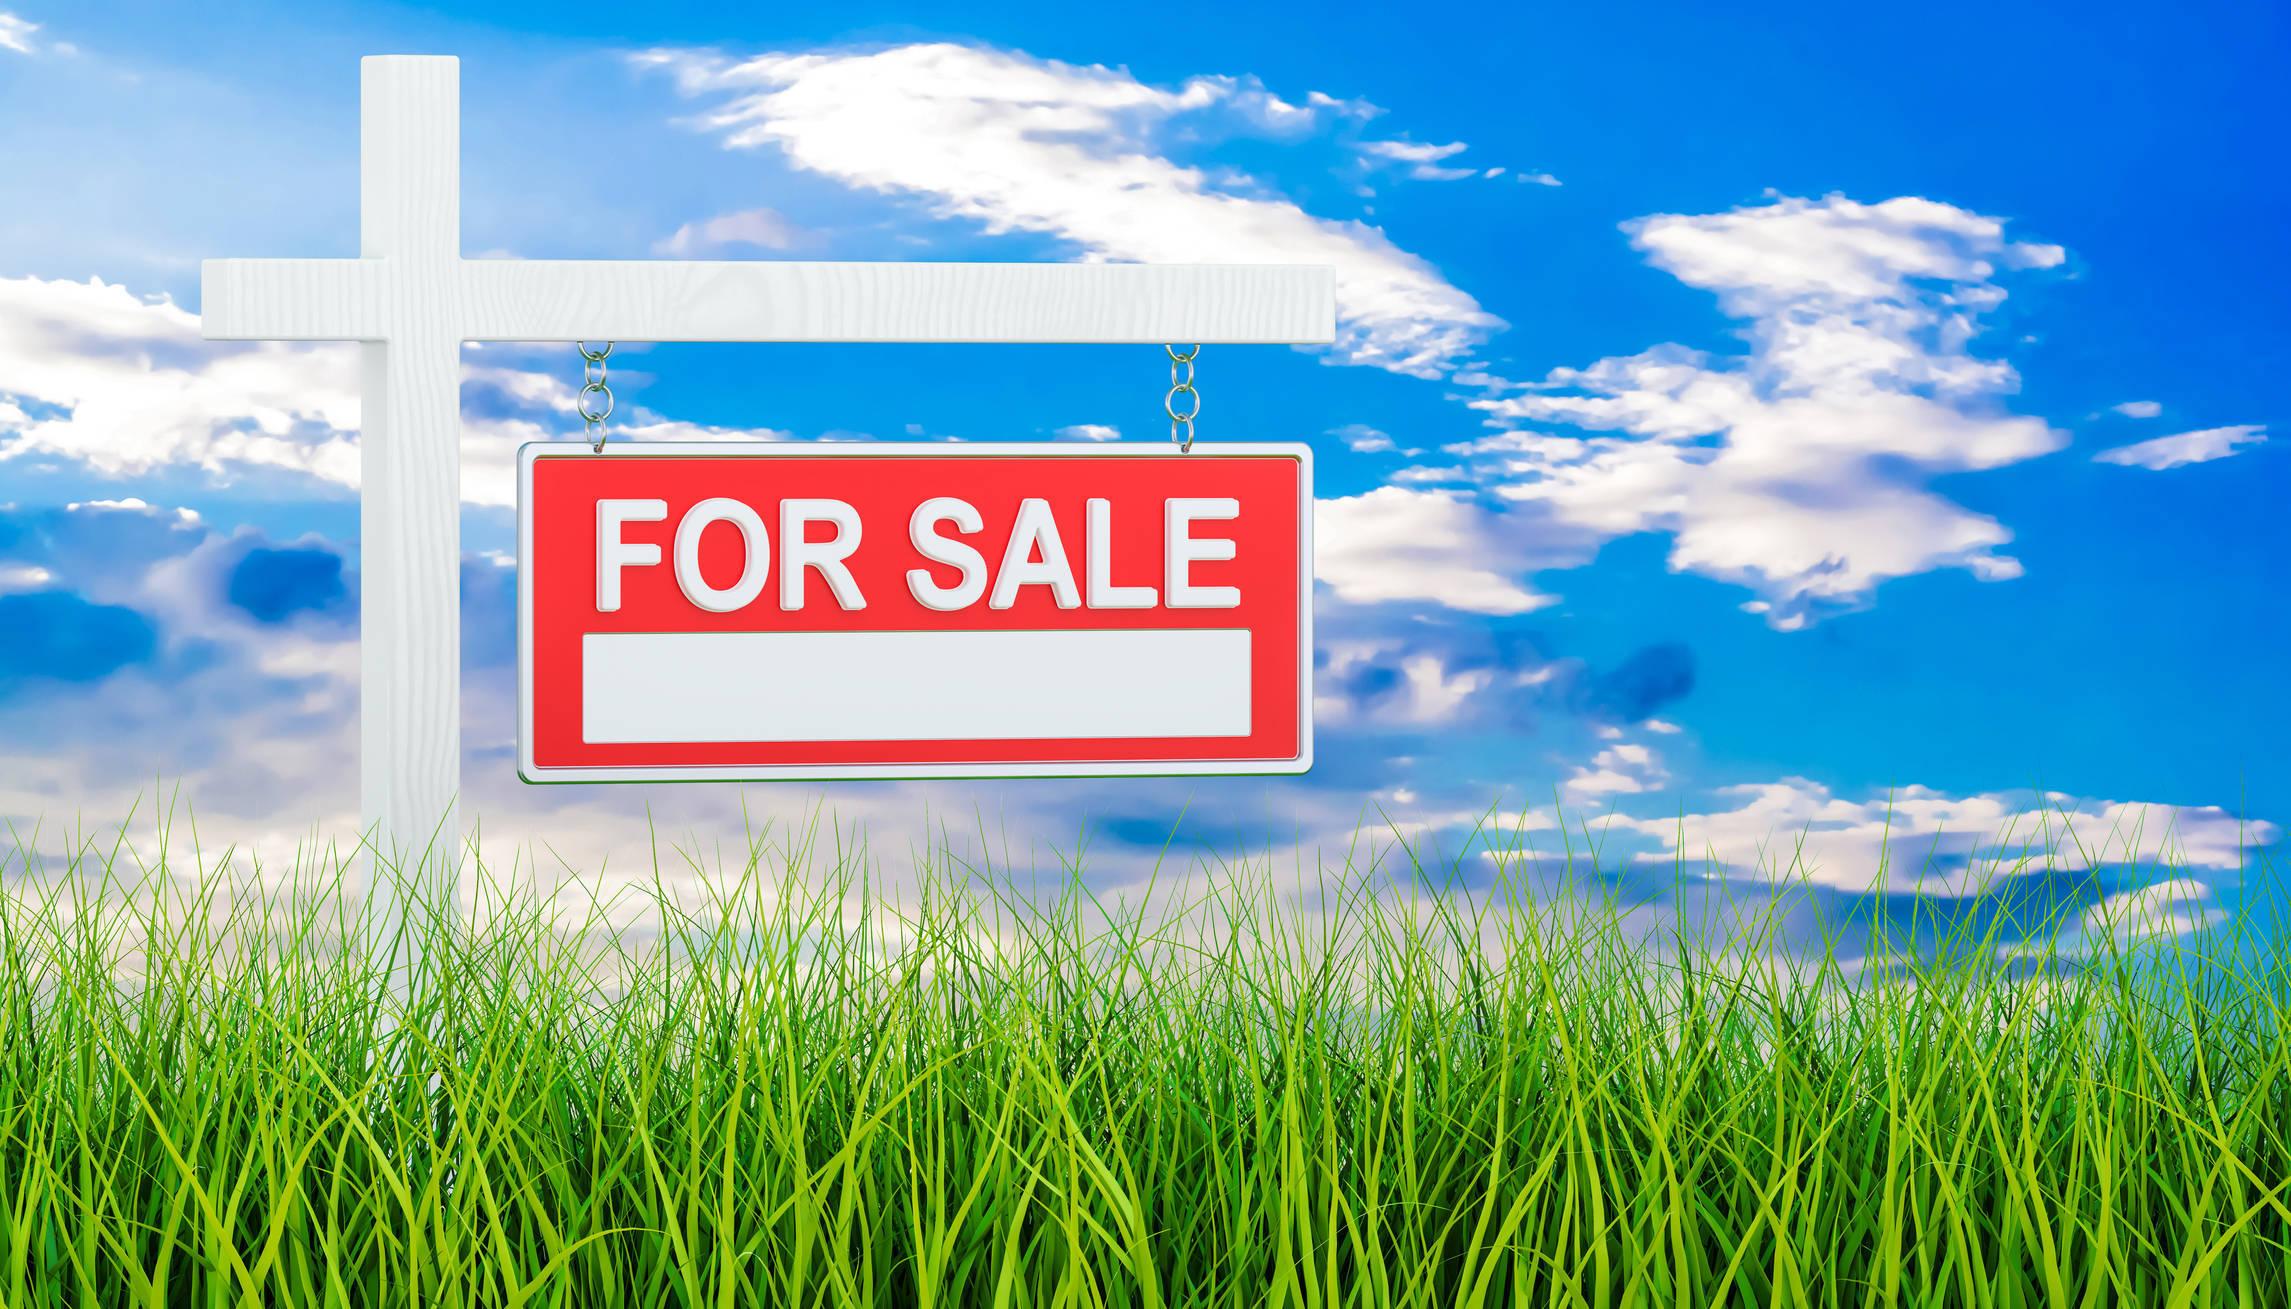 7da0f6e1fe4a5ddbb31f_for_sale_land_commercial_property.jpg